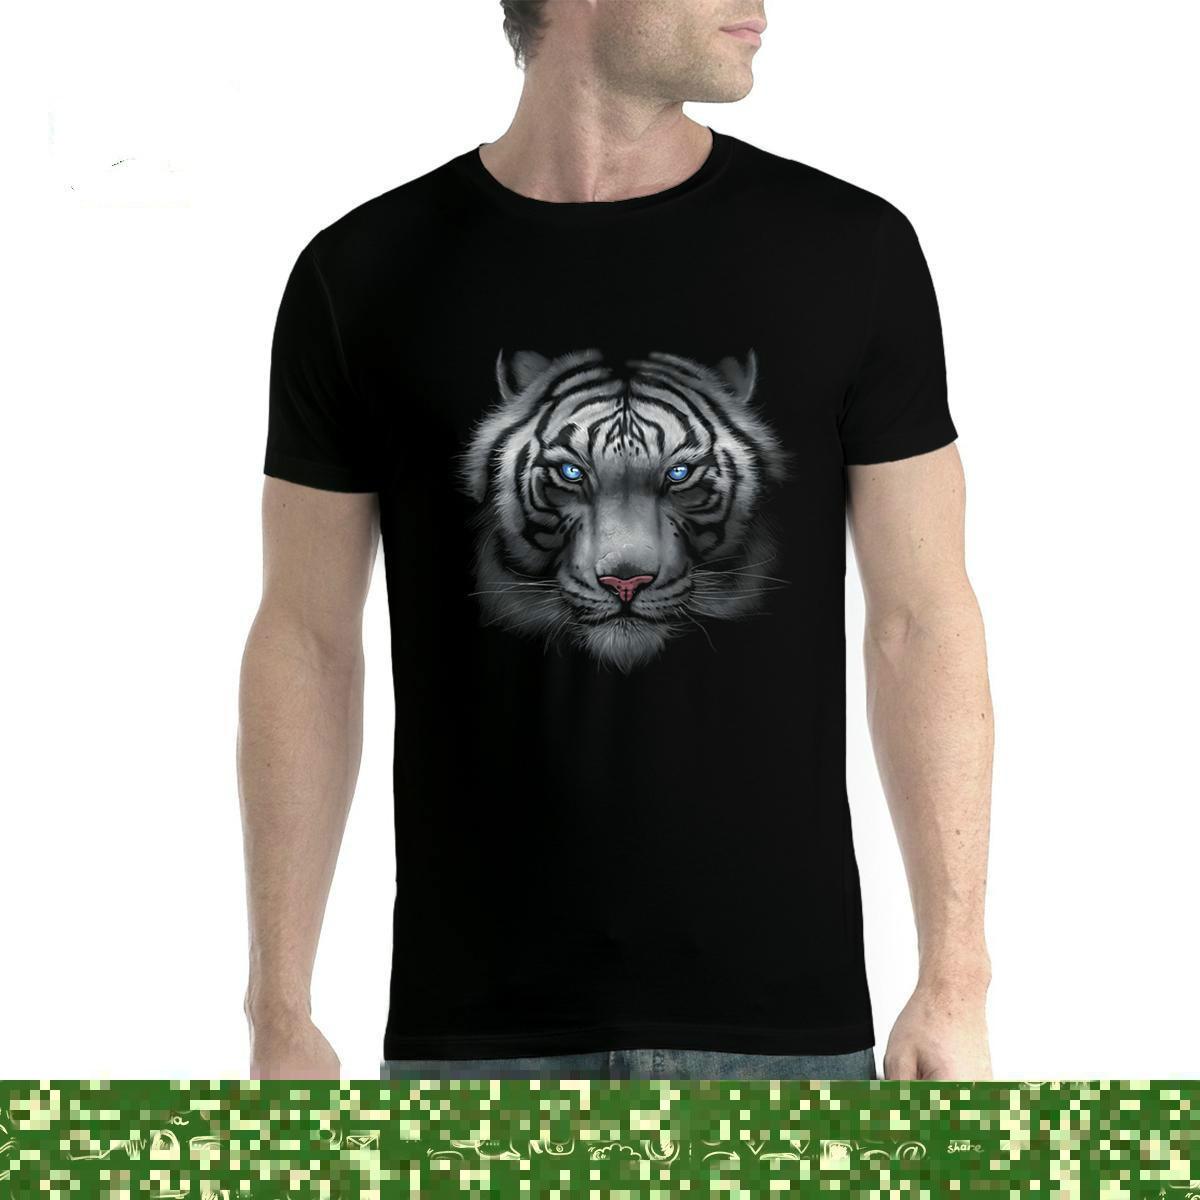 e64a182f818cc Белый тигр животные синие глаза Мужская футболка XS-5XL Новинка - b ...